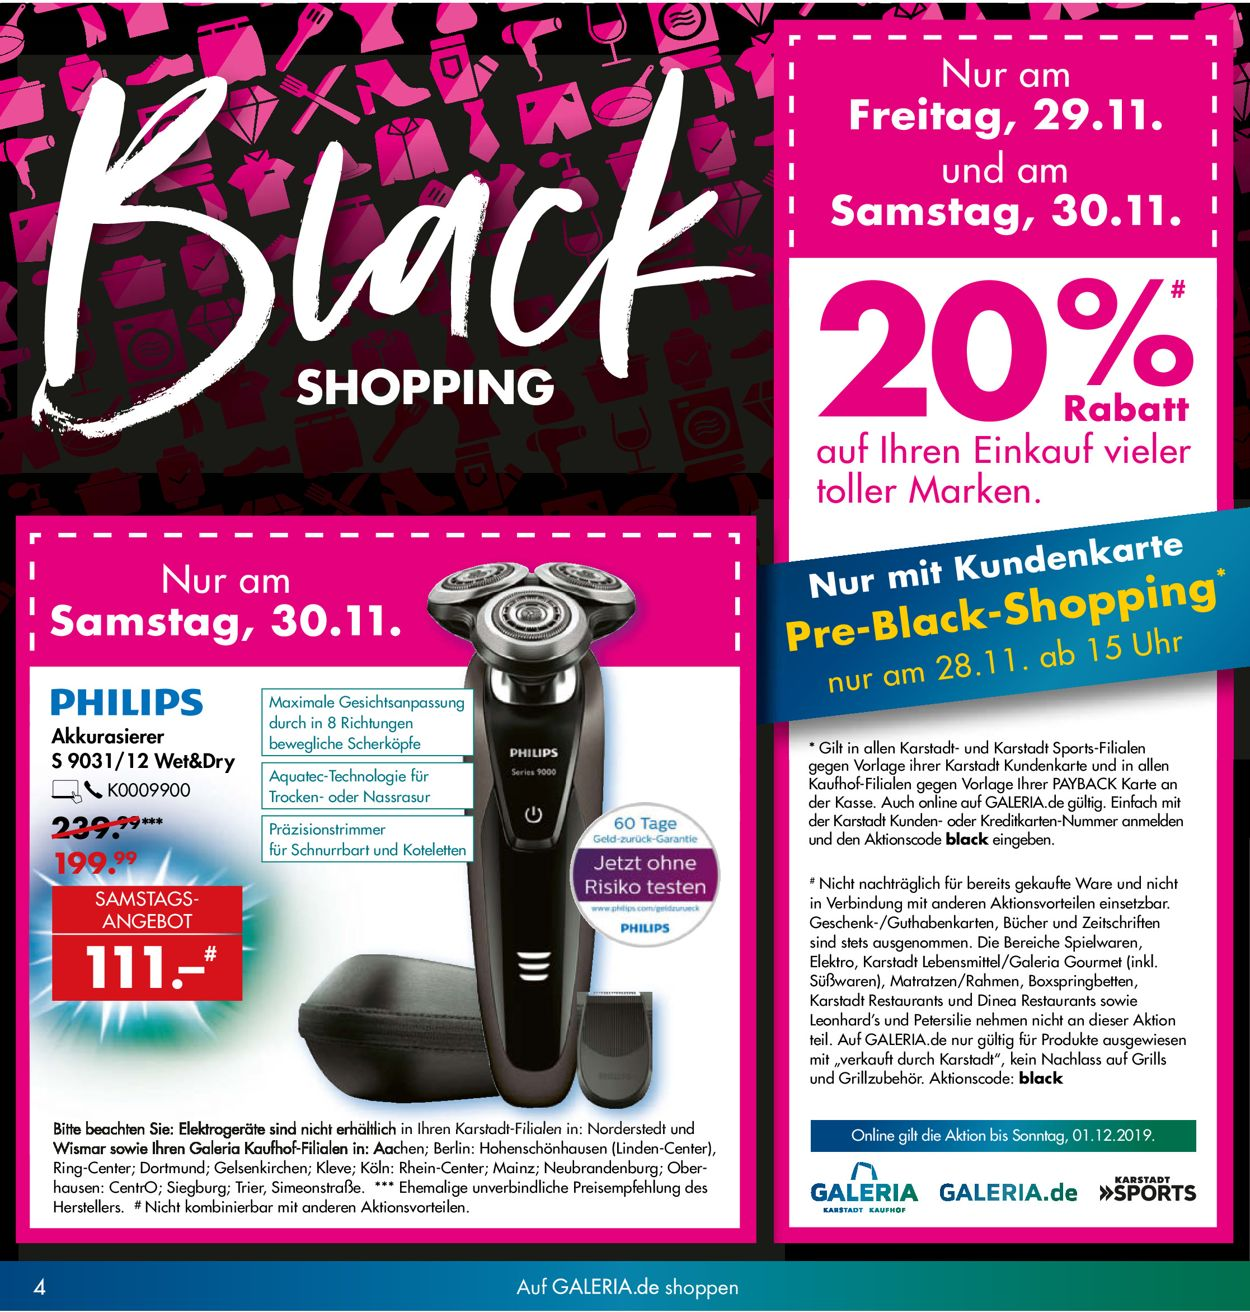 Black Friday in Mainz |